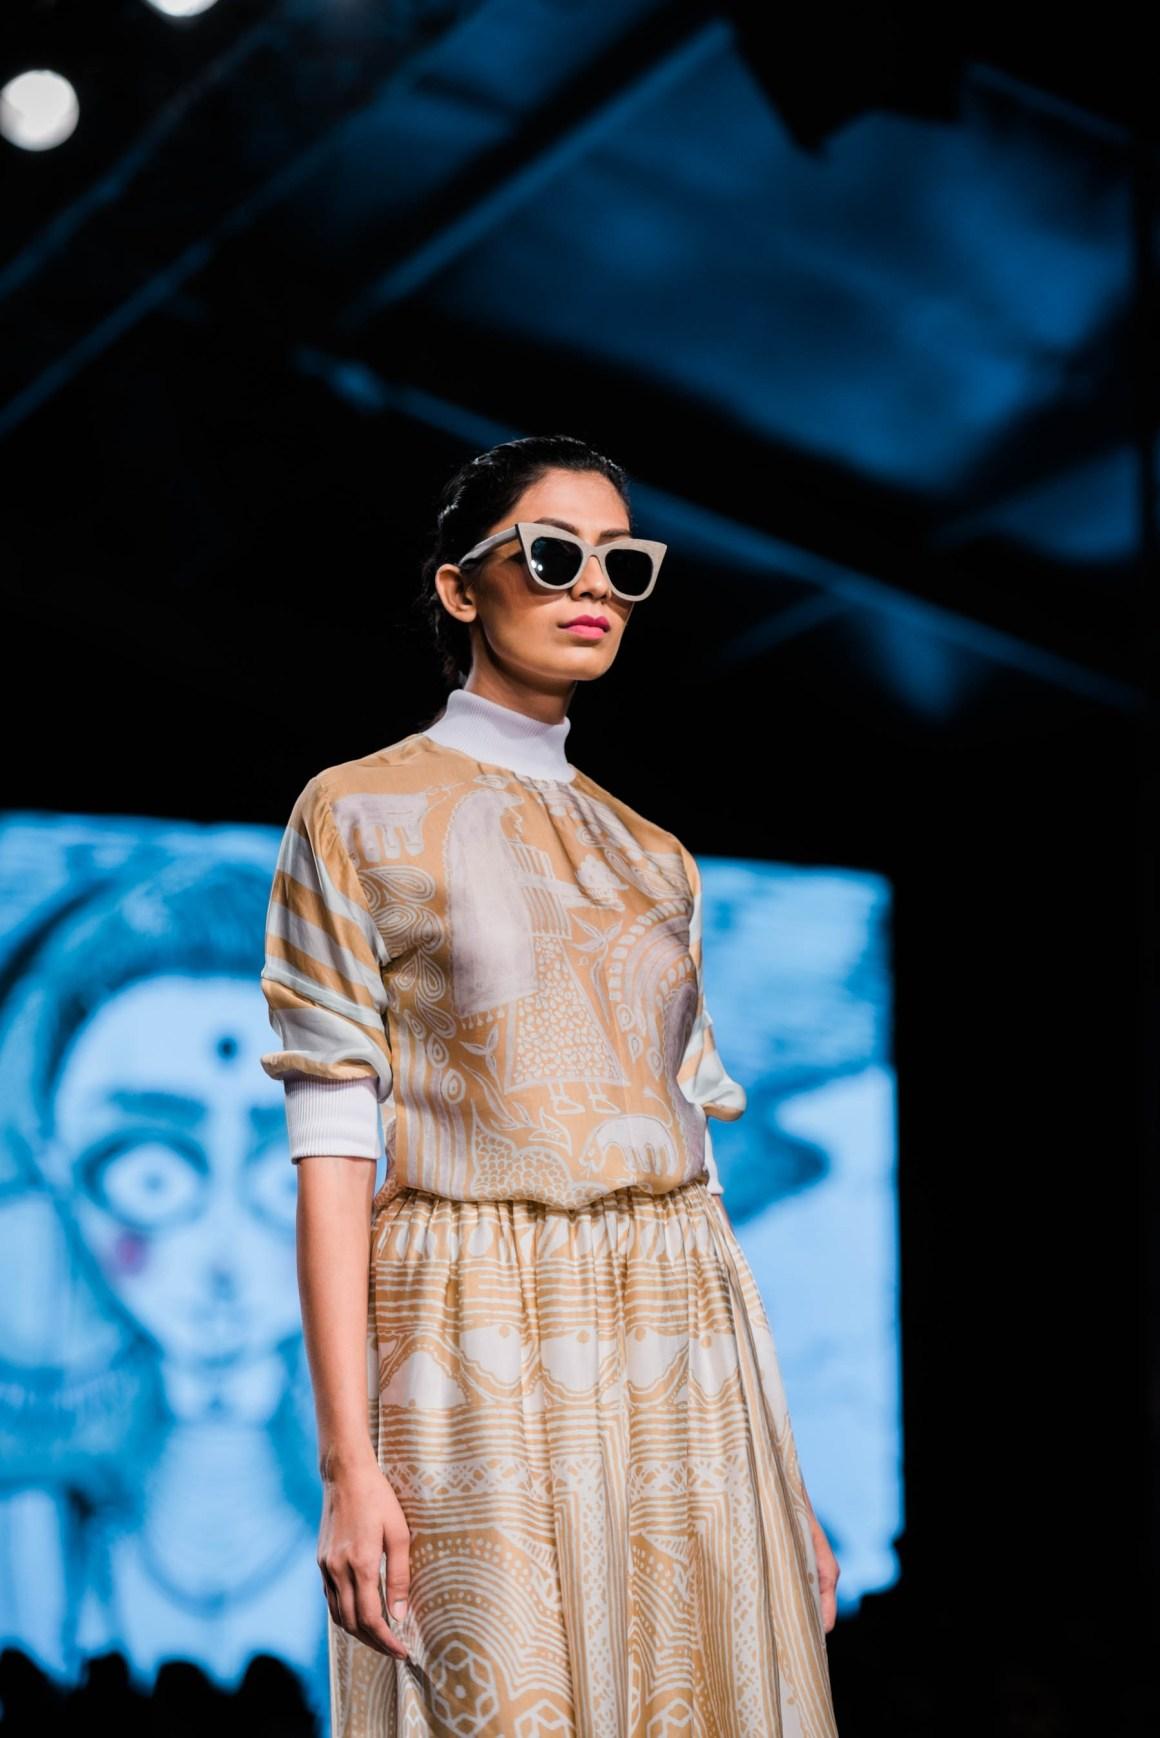 Naina Redhu, Naina.co, Aartivijay Gupta, Fashion Designer, FDCI, Lotus MakeUp India Fashion Week Spring Summer 2019, LMIFWSS19, LMIFW, India Fashion Week, Fashion Week Delhi, MadeInIndia, Made In India, EyesForFashion, Professional Photographer, Blogger, Fashion Photographer, Lifestyle Photographer, Luxury Photographer, Delhi Photographer, Gurgaon Photographer, Delhi Blogger, Gurgaon Blogger, Indian Blogger